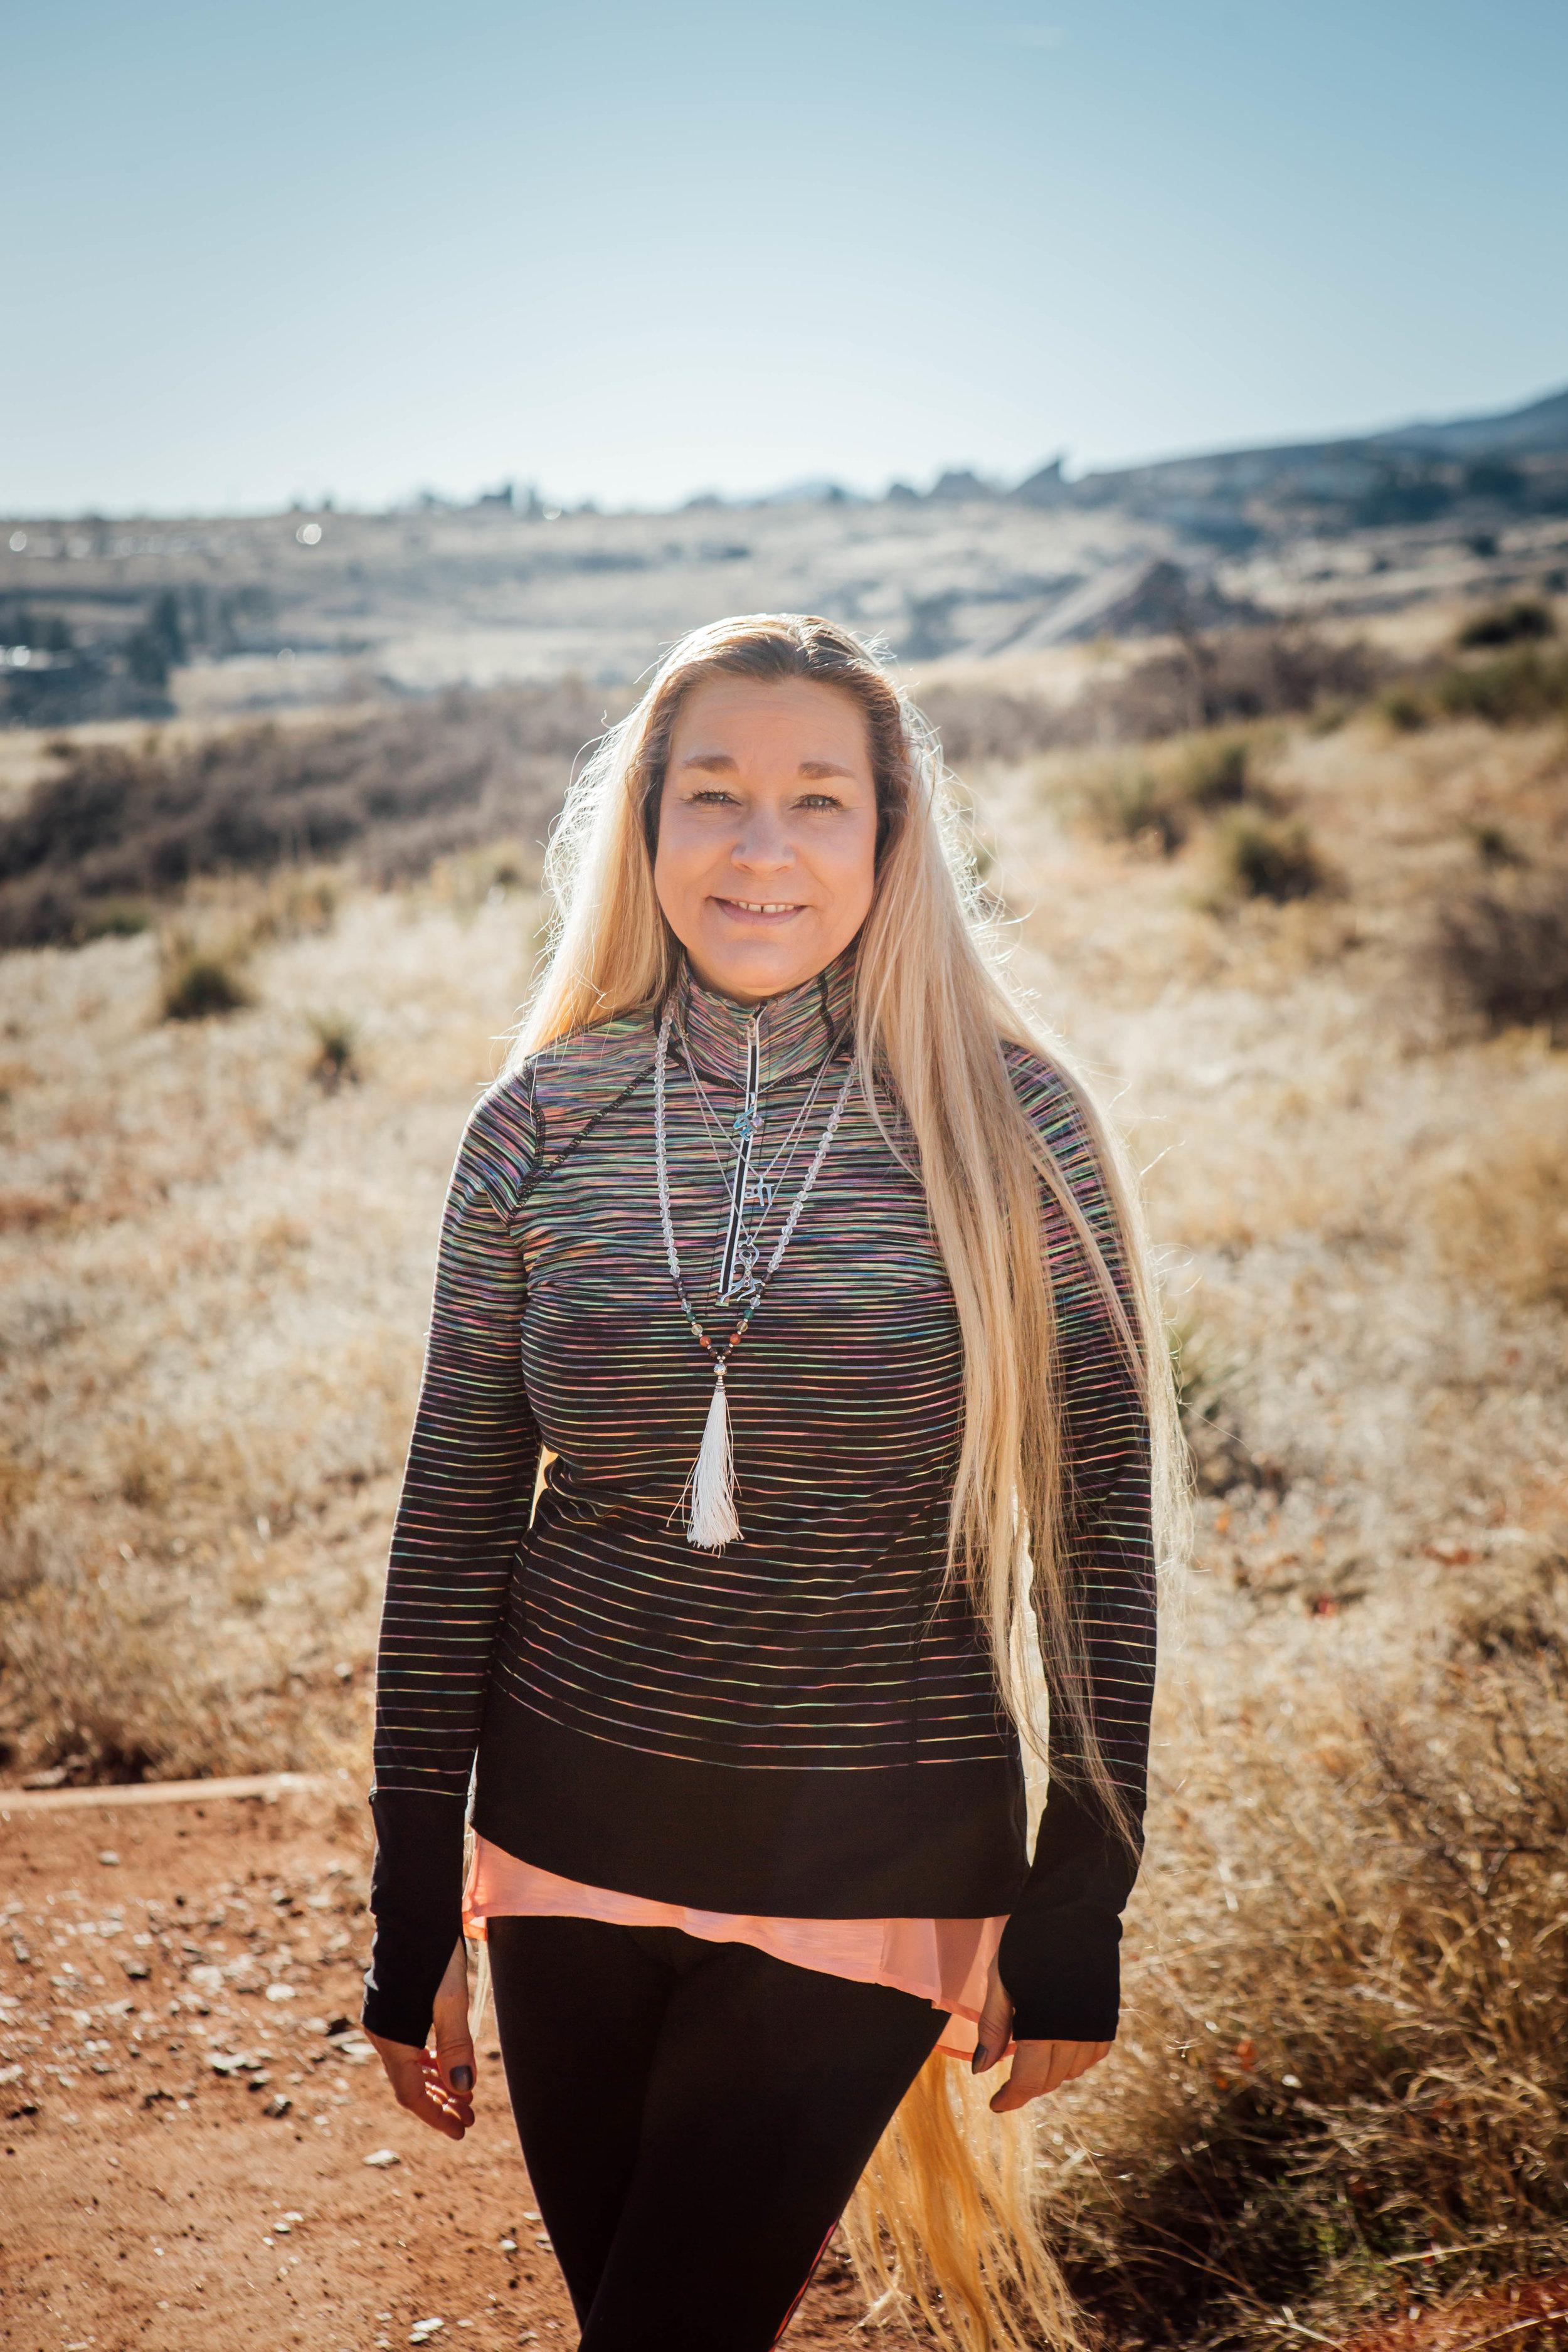 12082018_JanetSykora_Portrait_RedRocks_Colorado-7605-2.JPG